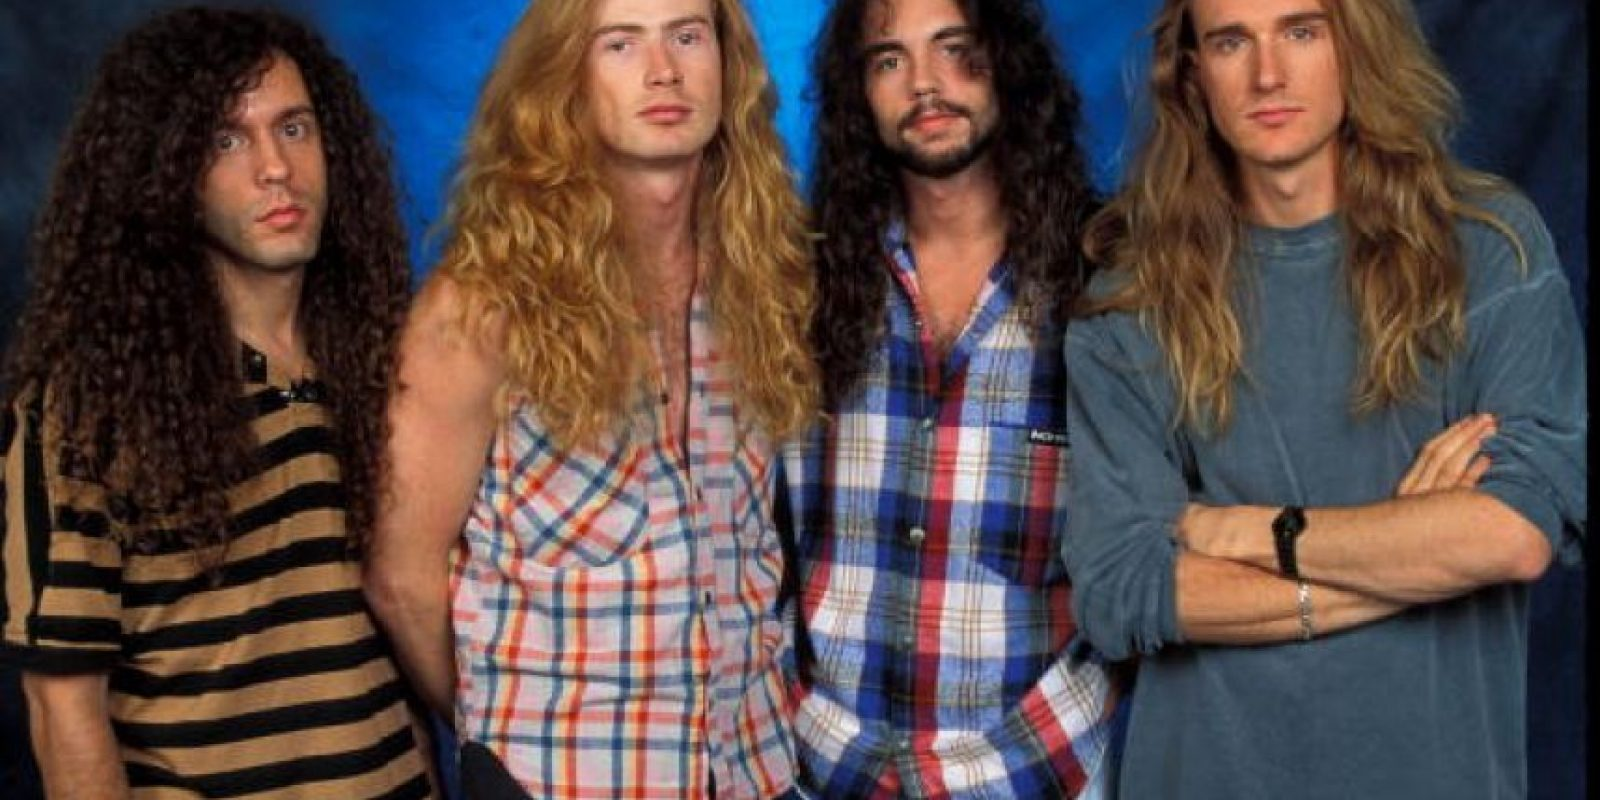 Nick Menza se integró a Megadeth en 1989 Foto:Getty Images